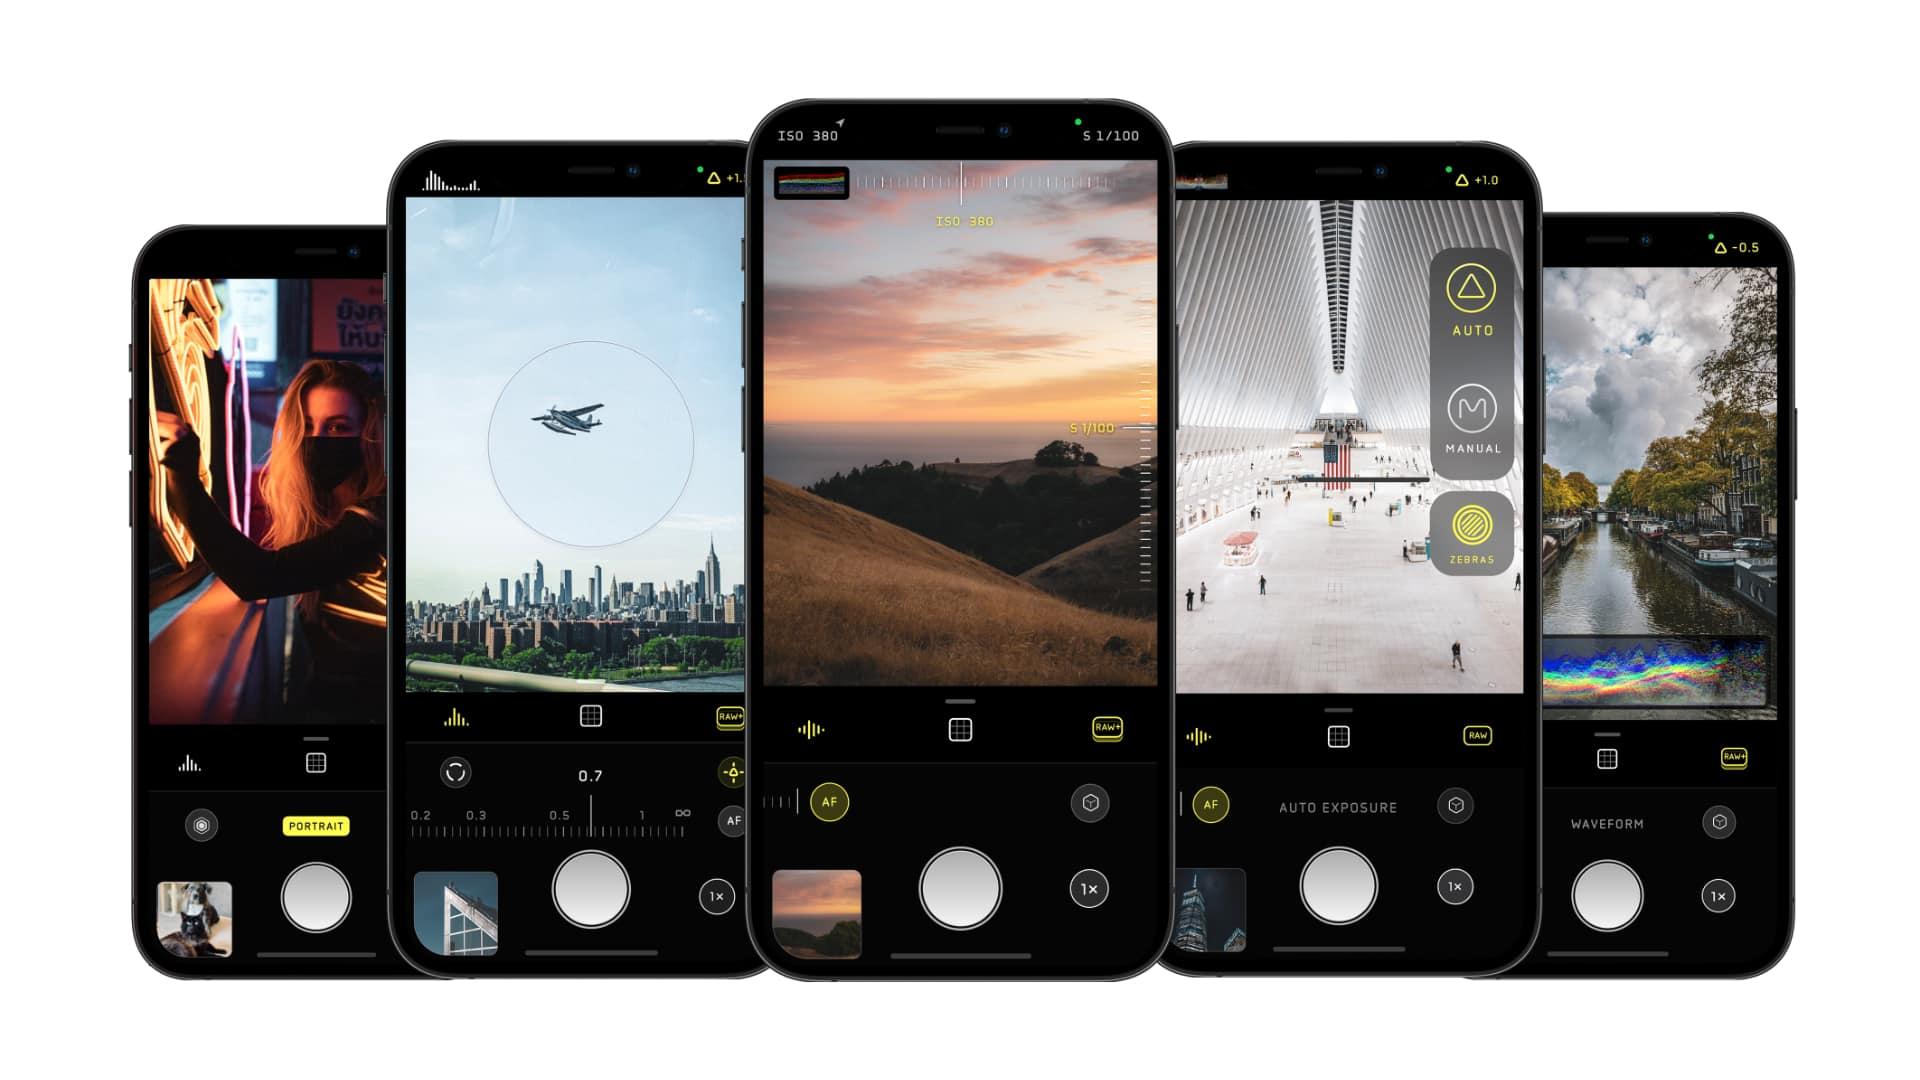 Halide app for iPhone